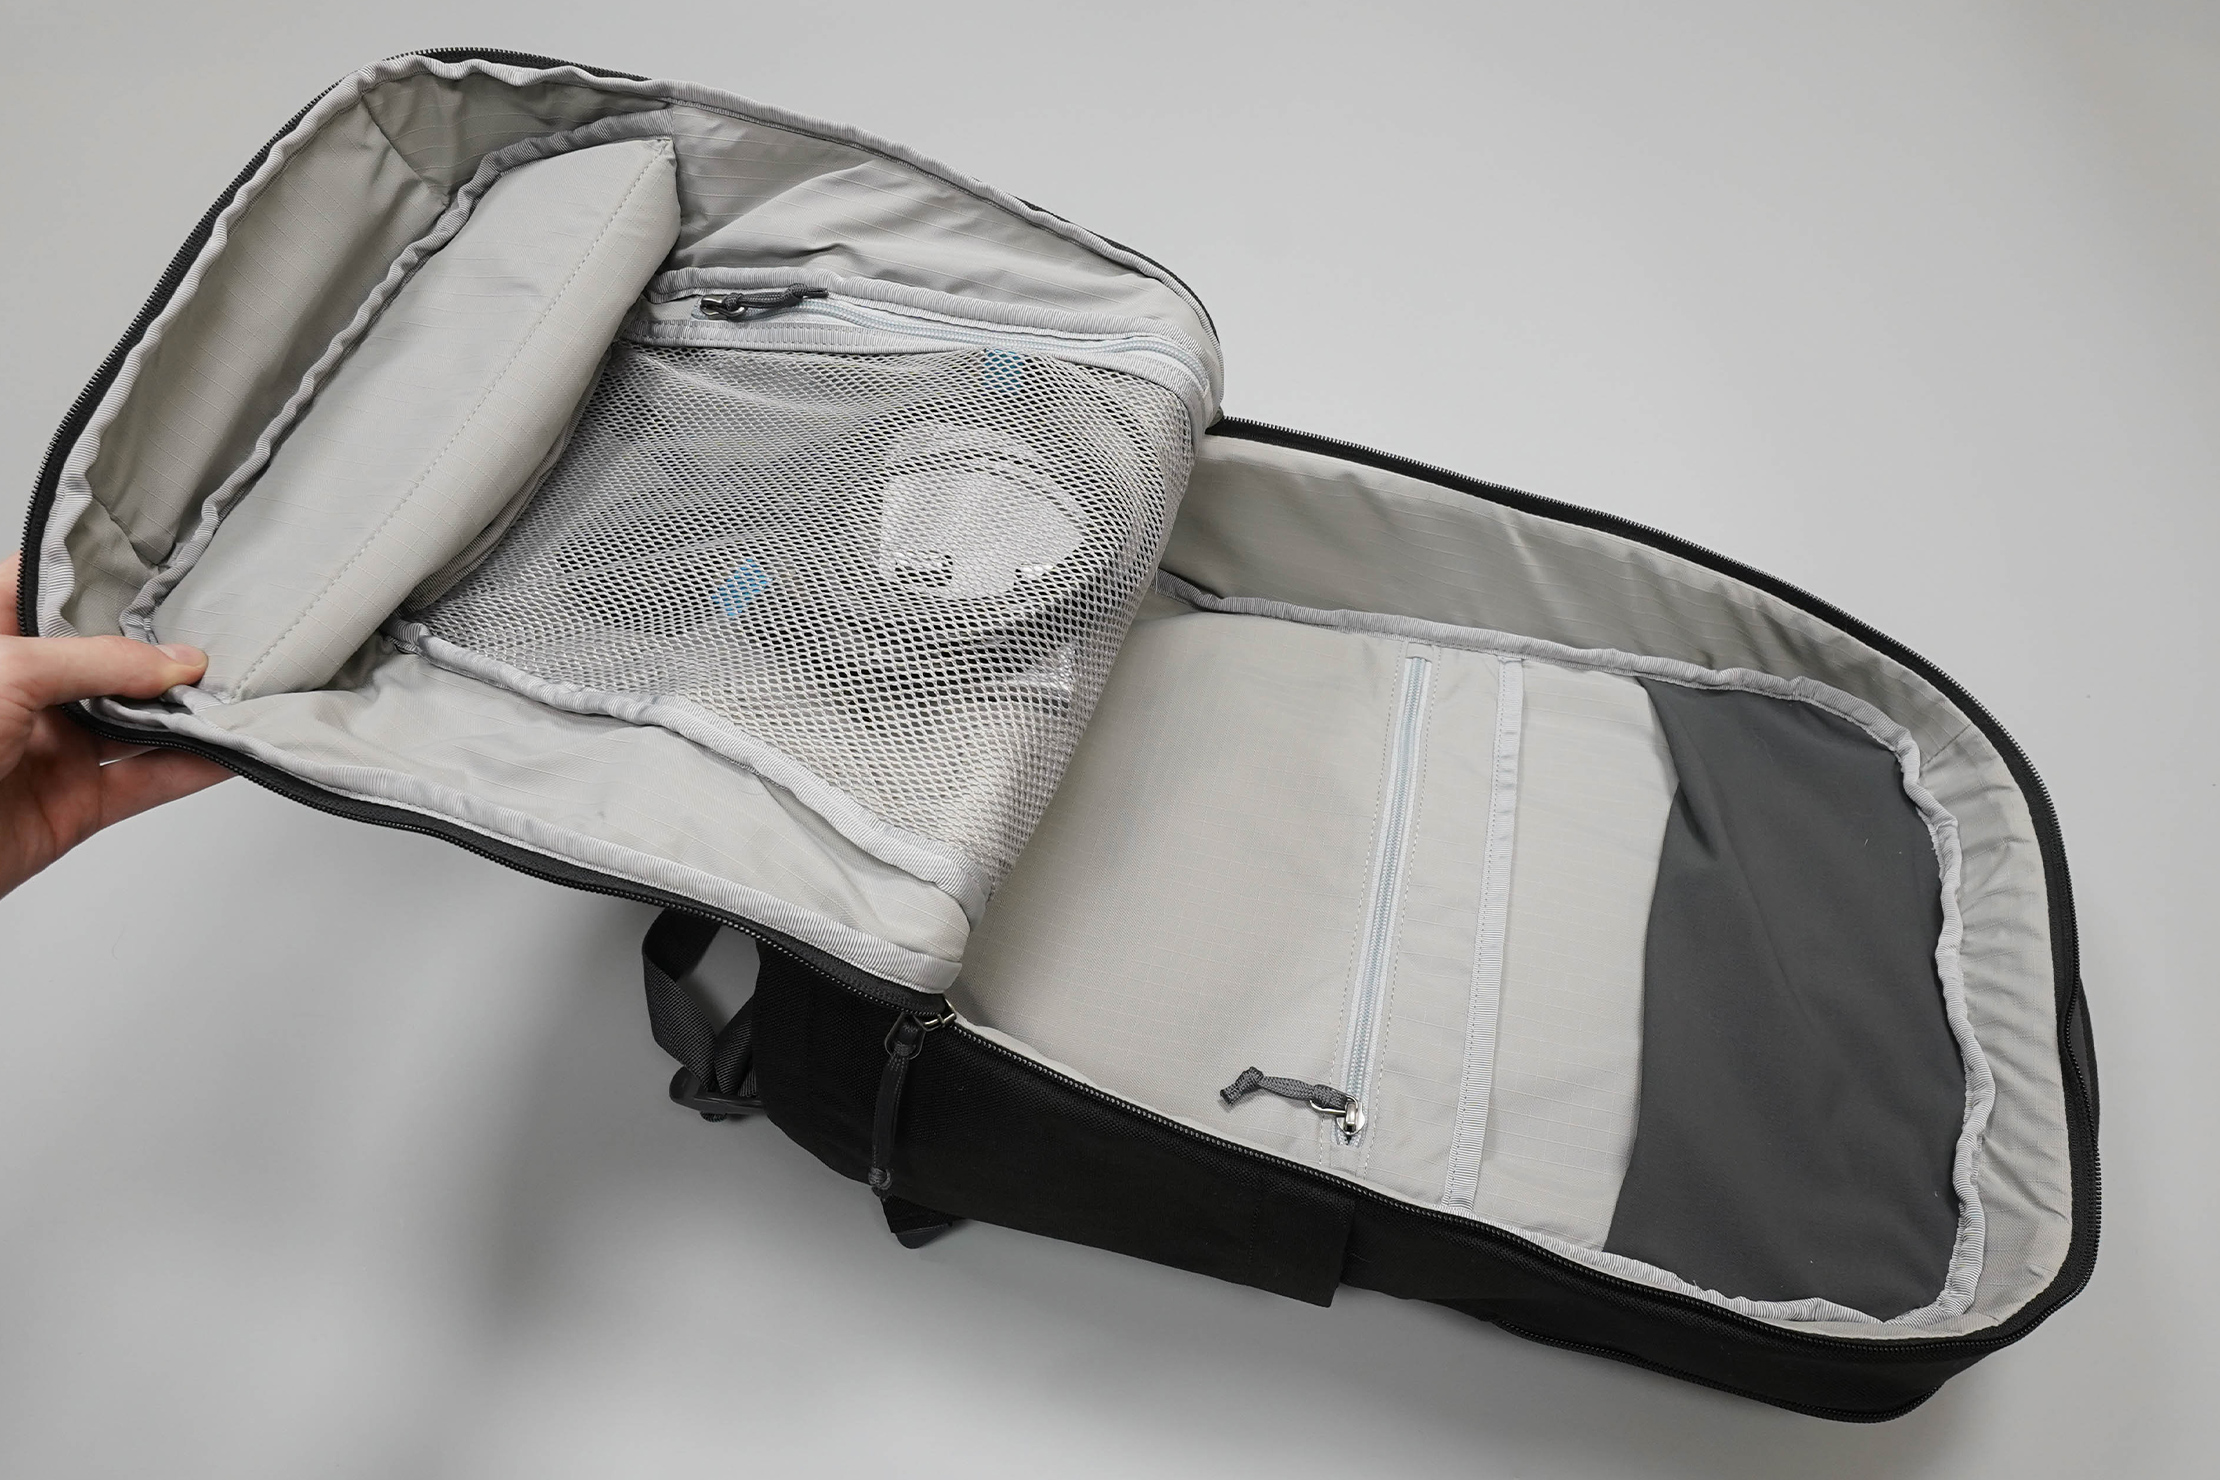 YETI Crossroads Backpack 23 Main Compartment